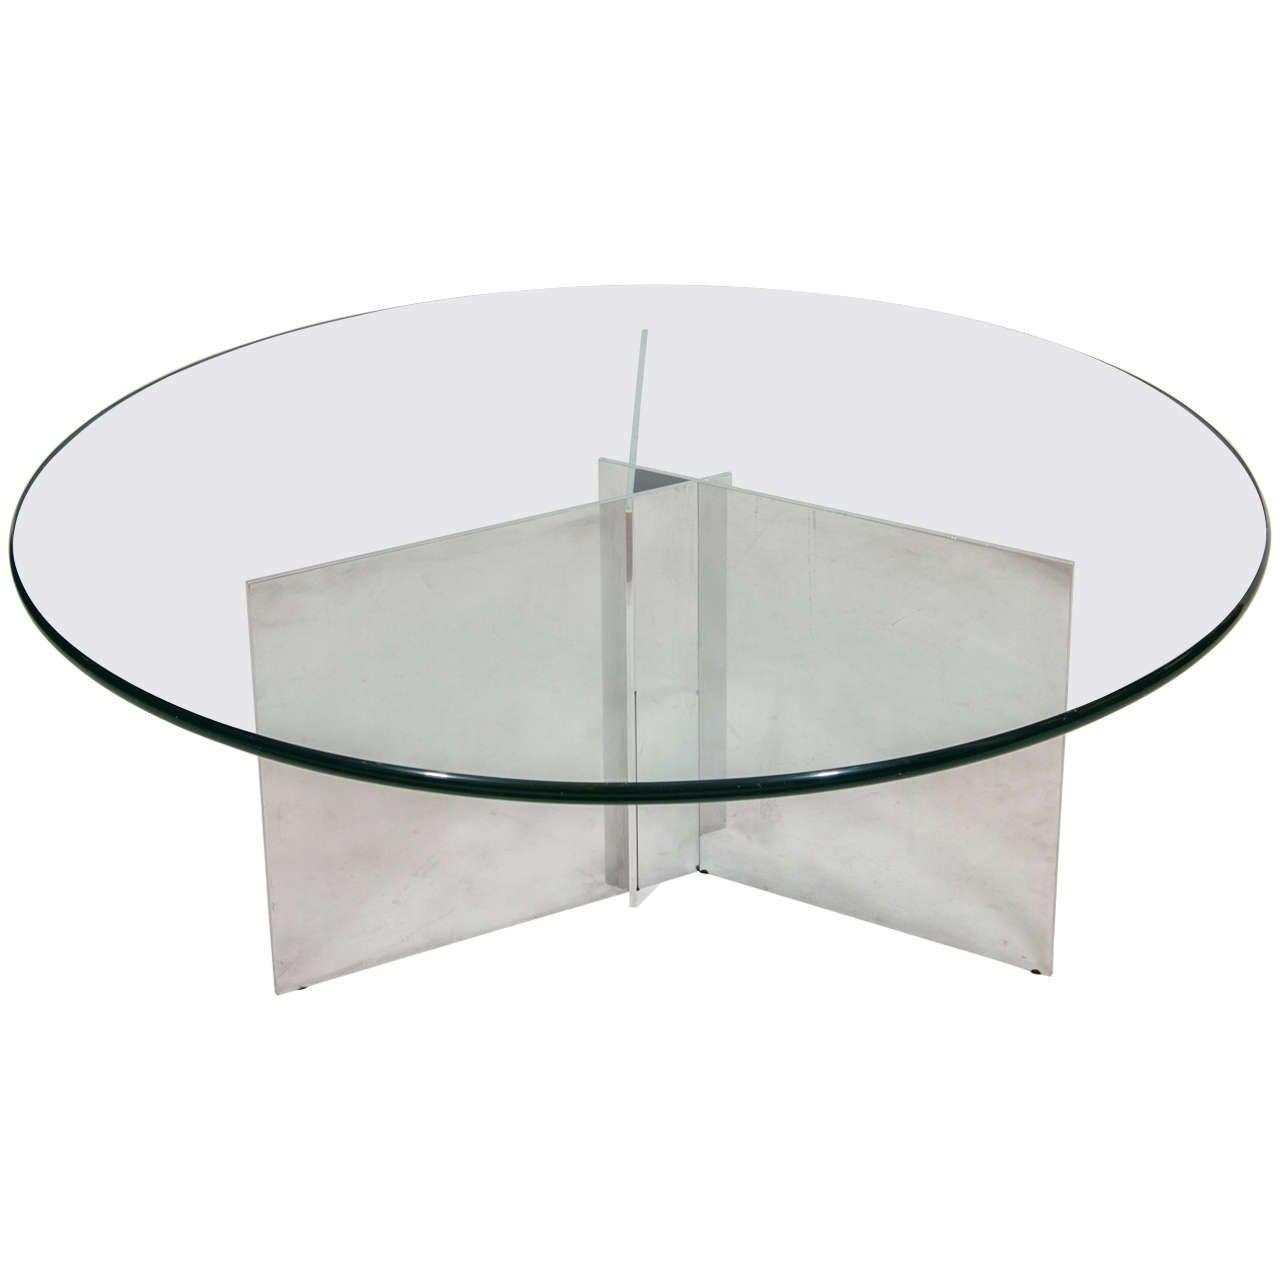 Paul Mayen Polished Aluminum Coffee Table